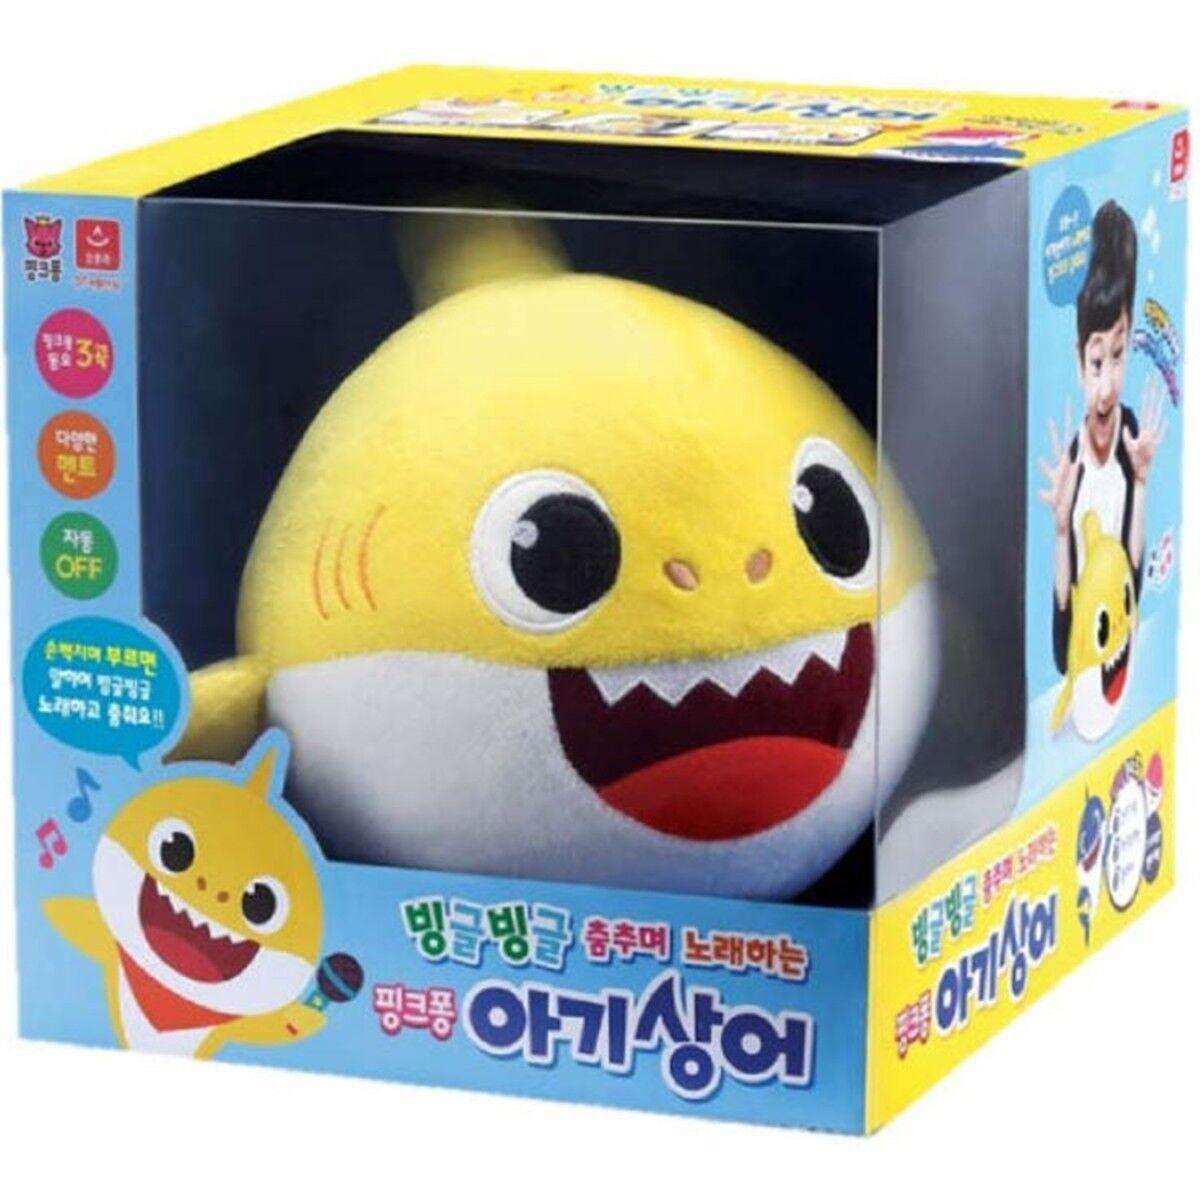 Rosafong Gelb  Baby Shark Doll Singing Dancing Toy 8.6